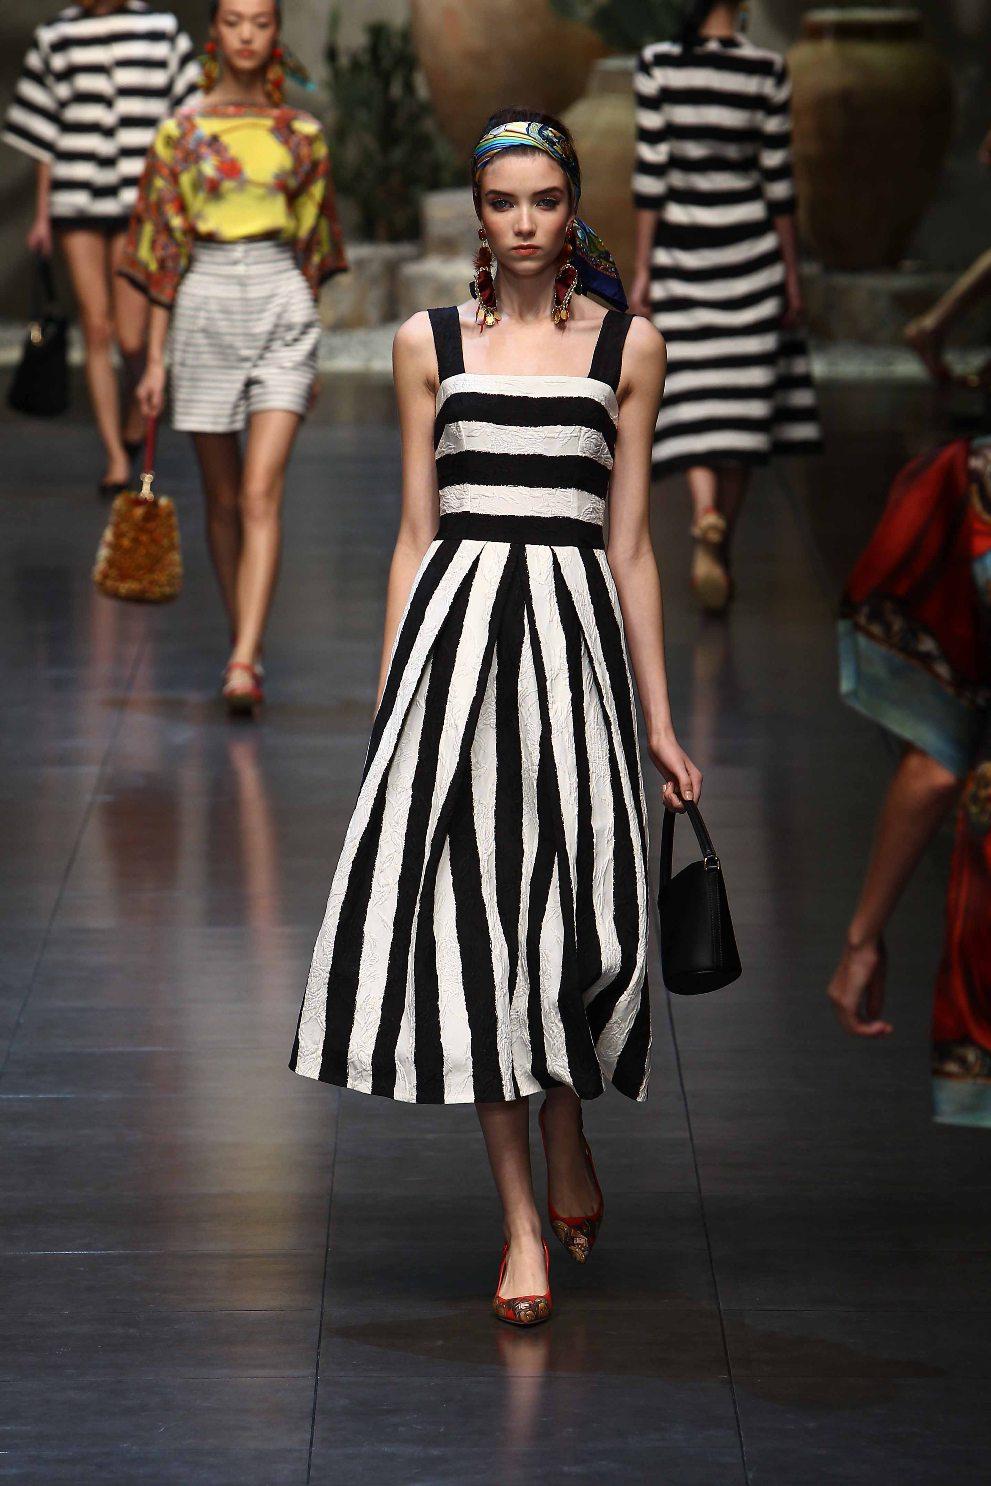 4d46401674cb Τα midi φορέματα είναι κομψά, στιλάτα και ταιριάζουν τόσο με φλατ όσο και  με ψηλοτάκουνα πέδιλα. Είναι ιδανικά για τις πρωινές εμφανίσεις σας στο  γραφείο, ...